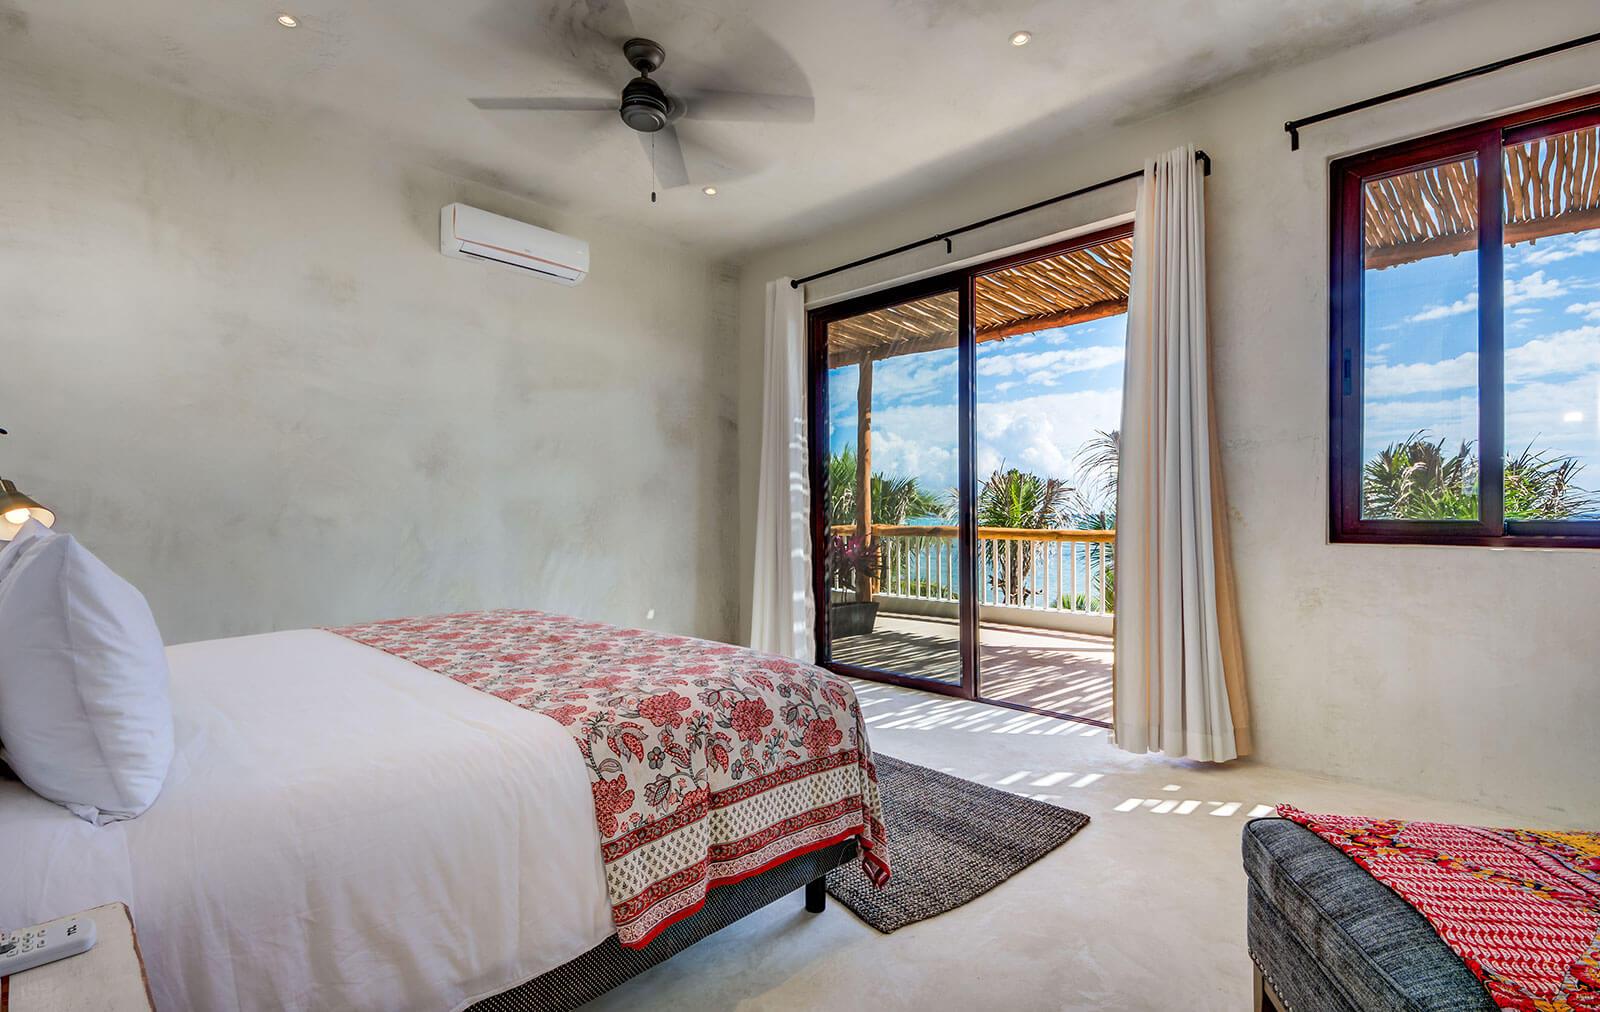 Maya_Luxe_Riviera_Maya_Luxury_Villas_Experiences_Tulum_Soliman_Bay_5_Bedrooms_26.jpg